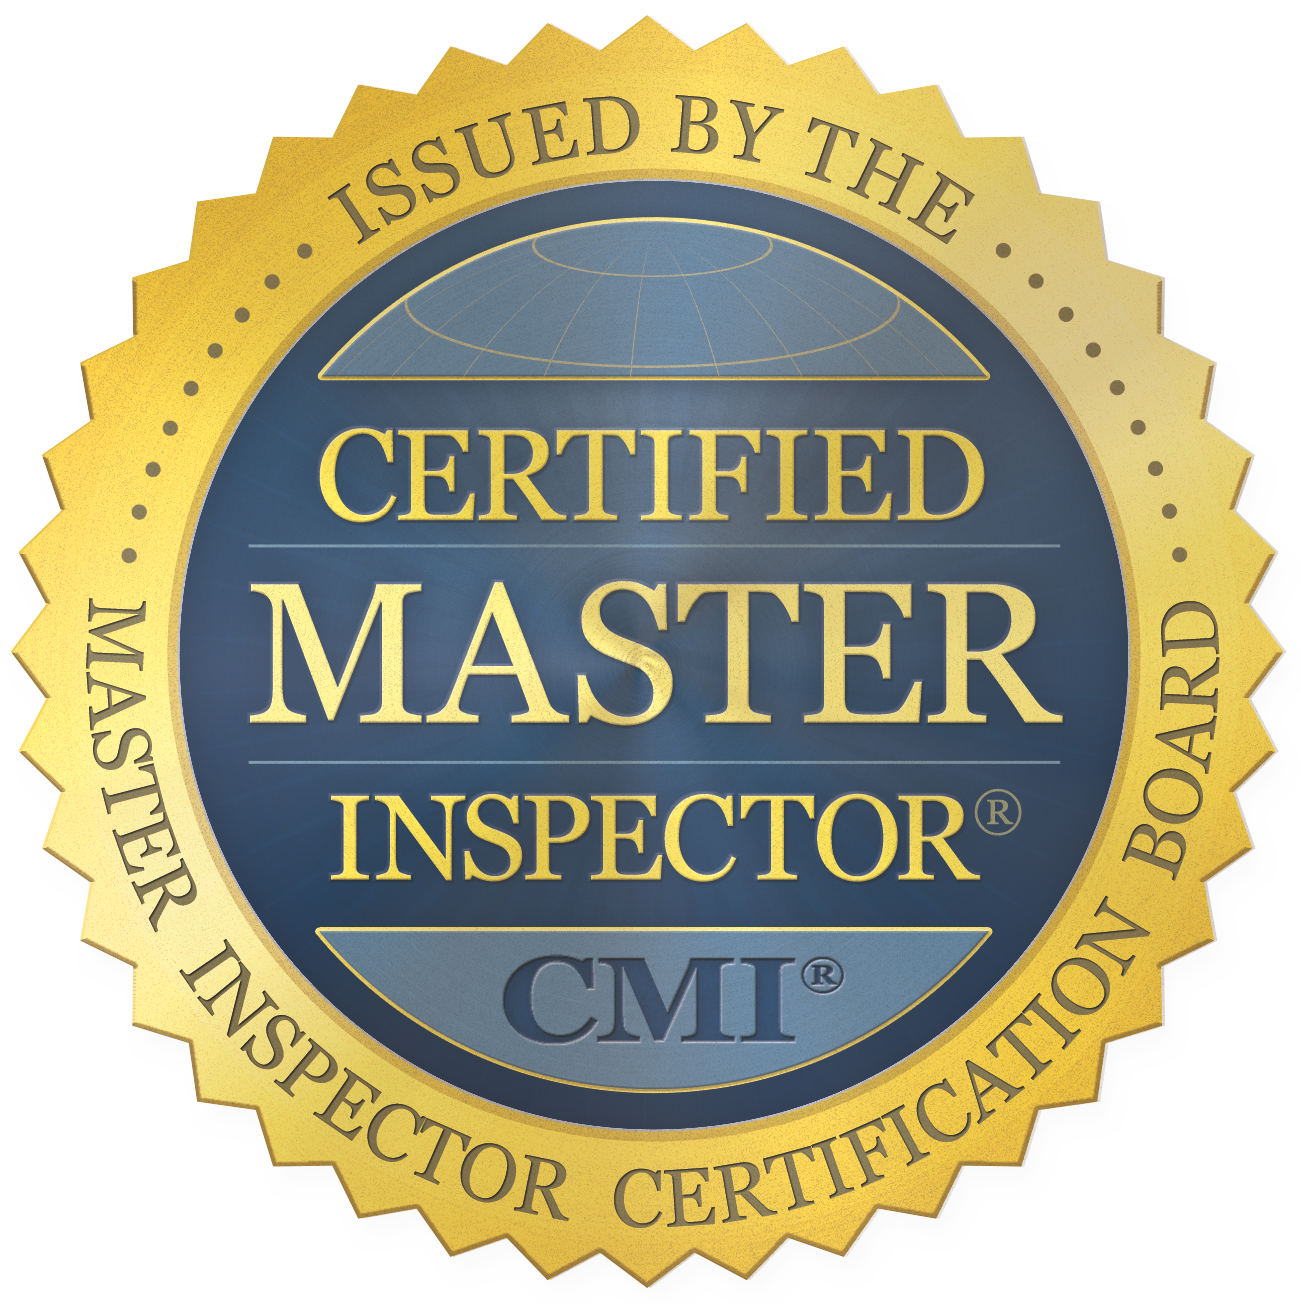 CMI - Master Certified Inspector certification